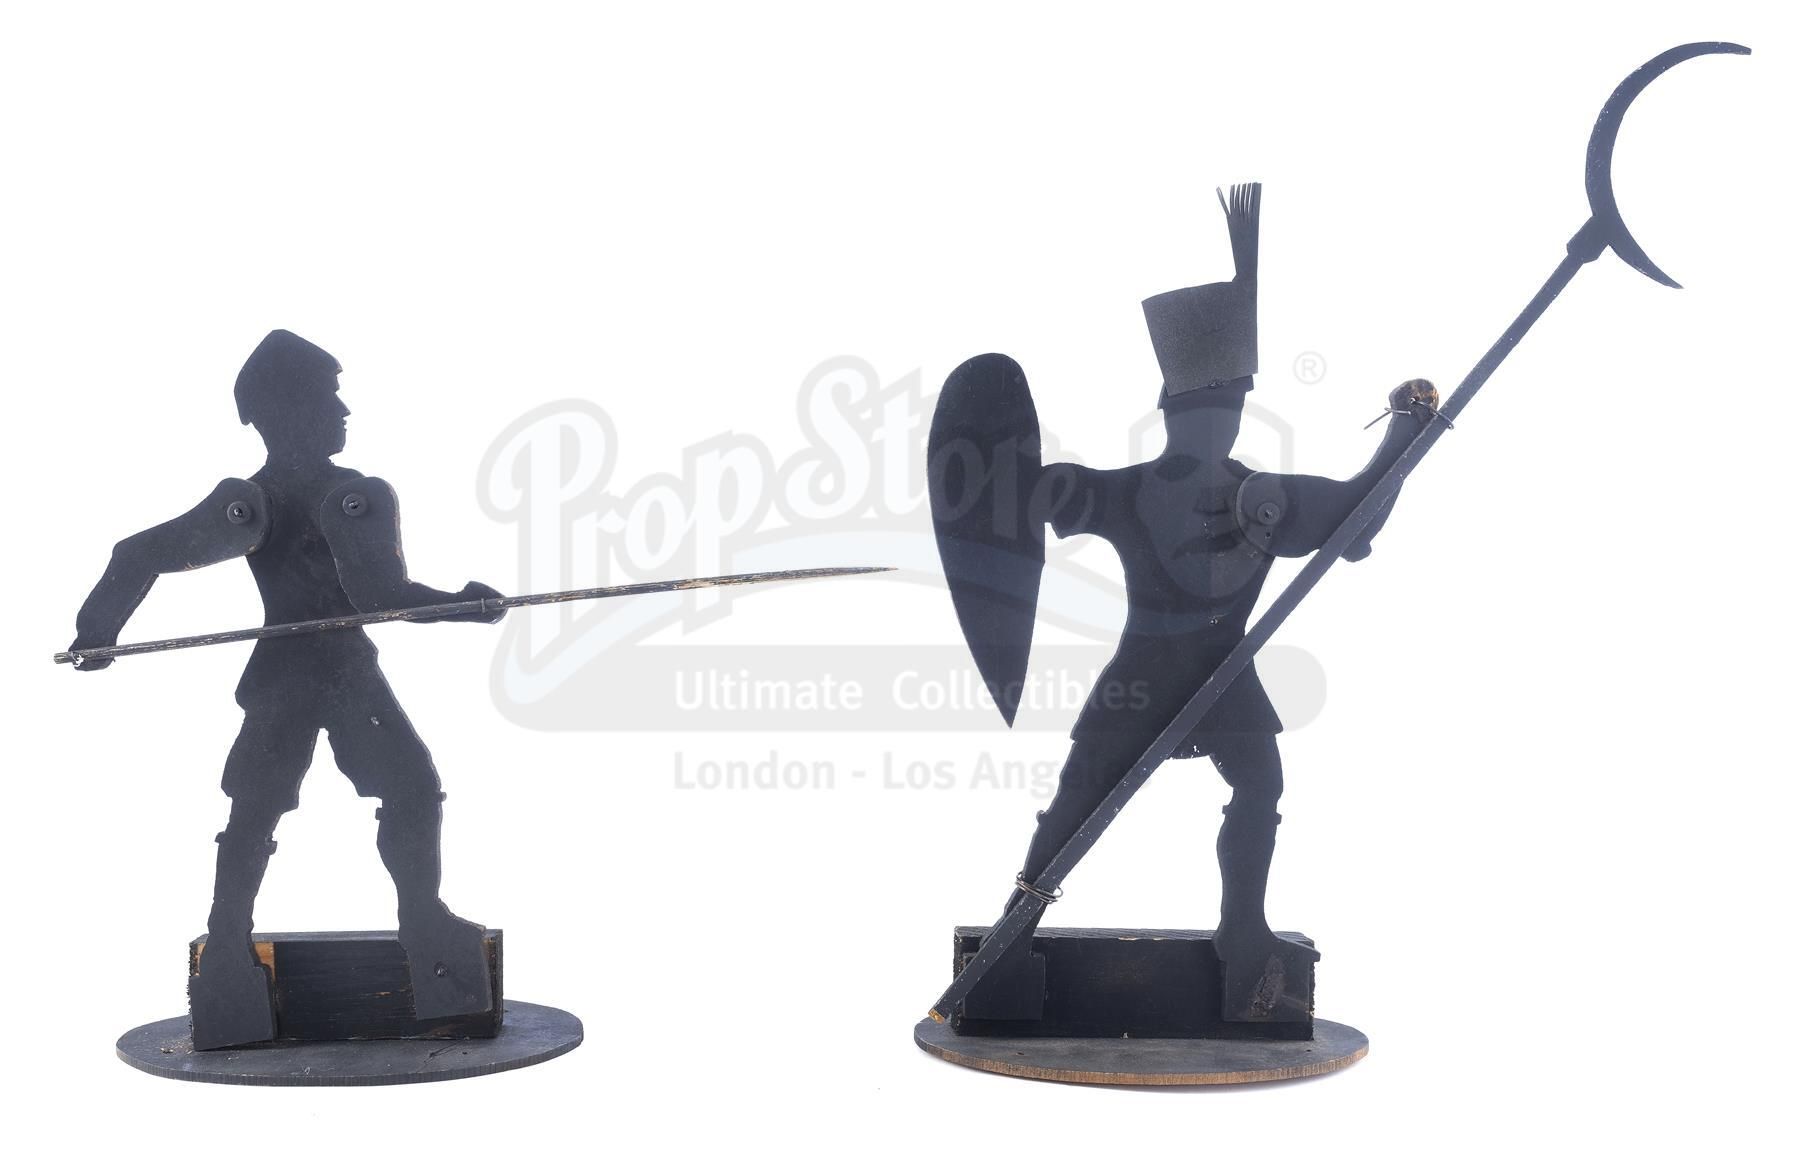 Lot # 545: BRAM STOKER'S DRACULA - Polearmsman and Spearman Theater Puppets